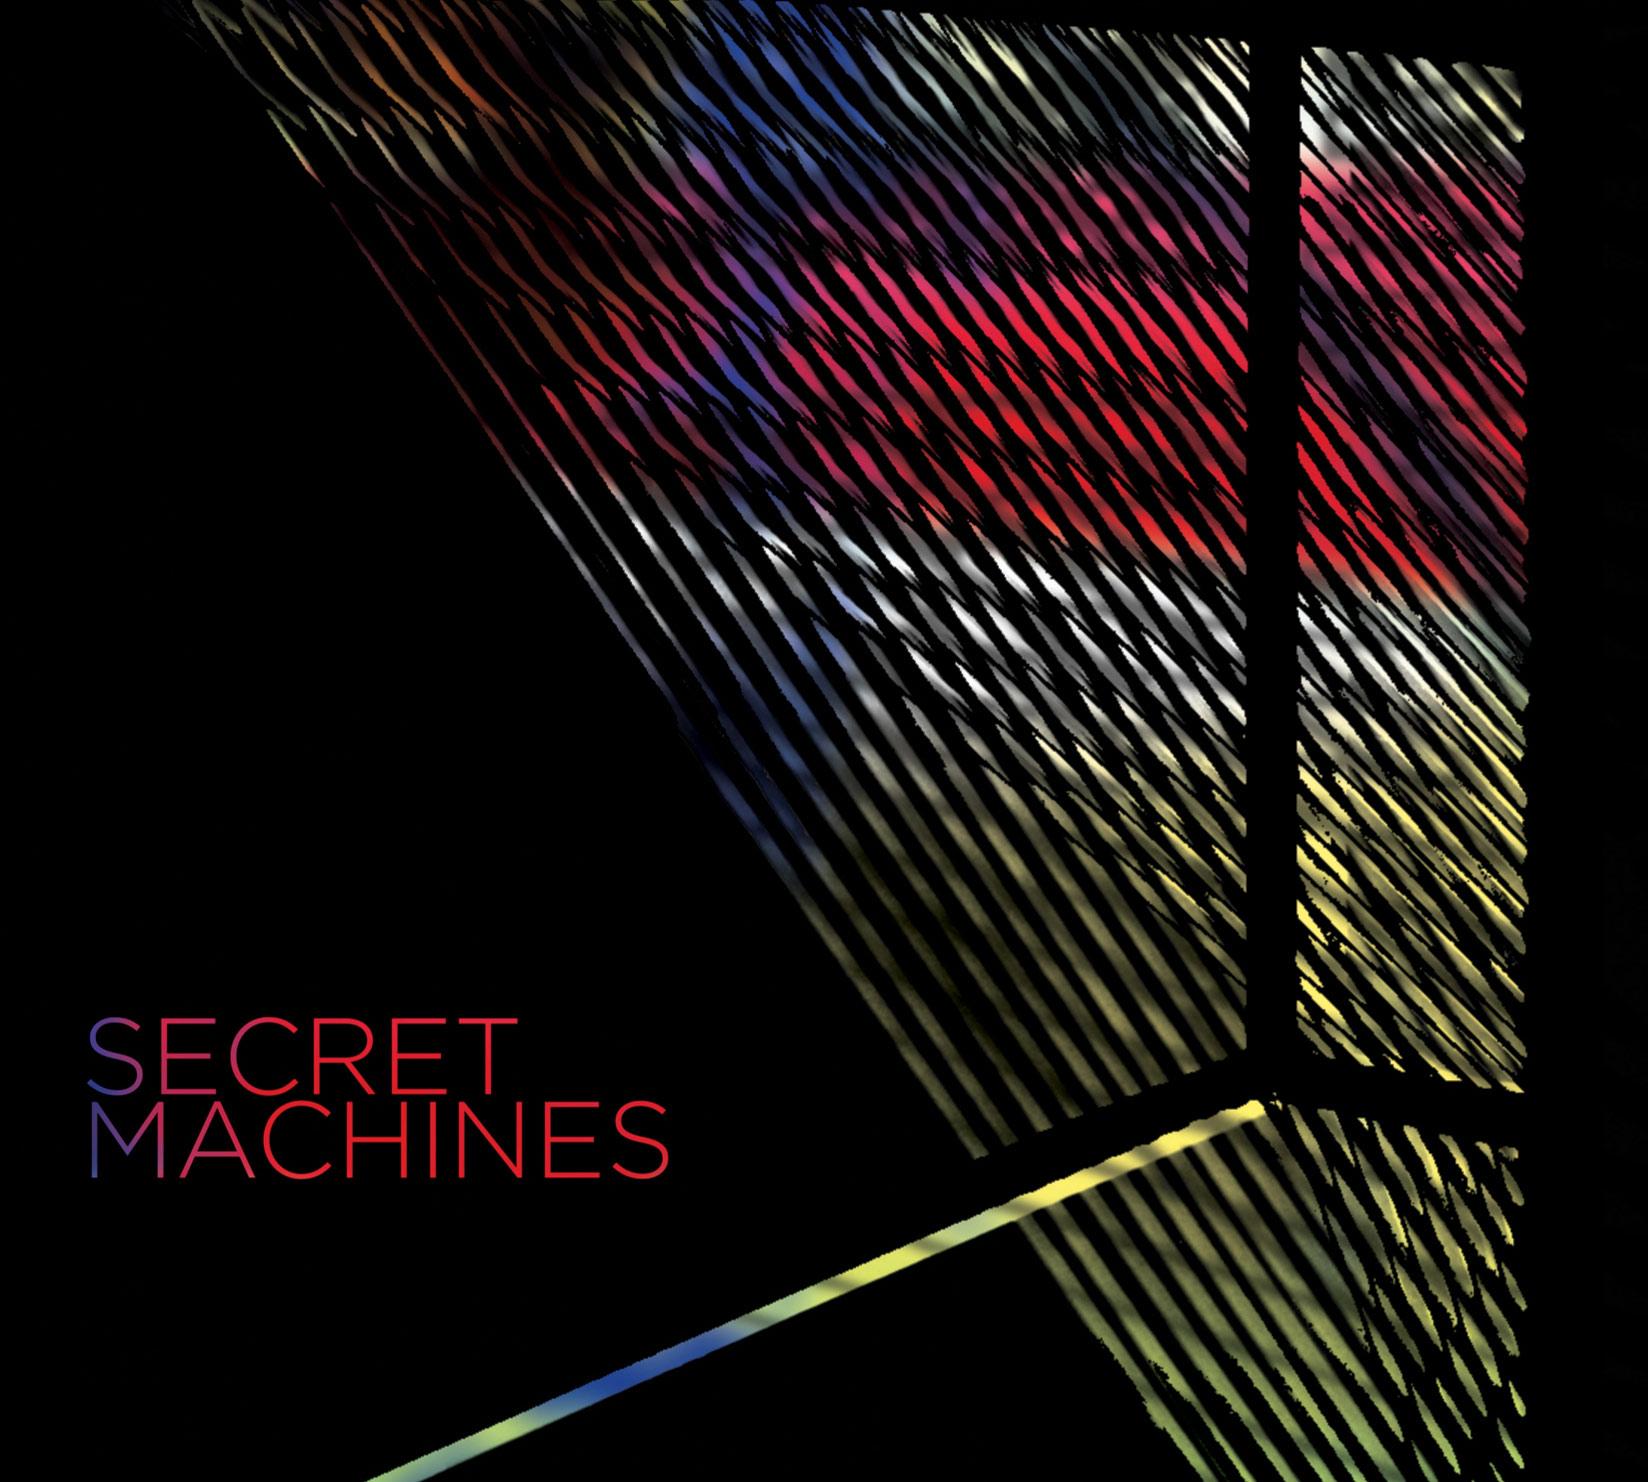 secretmachines_print1